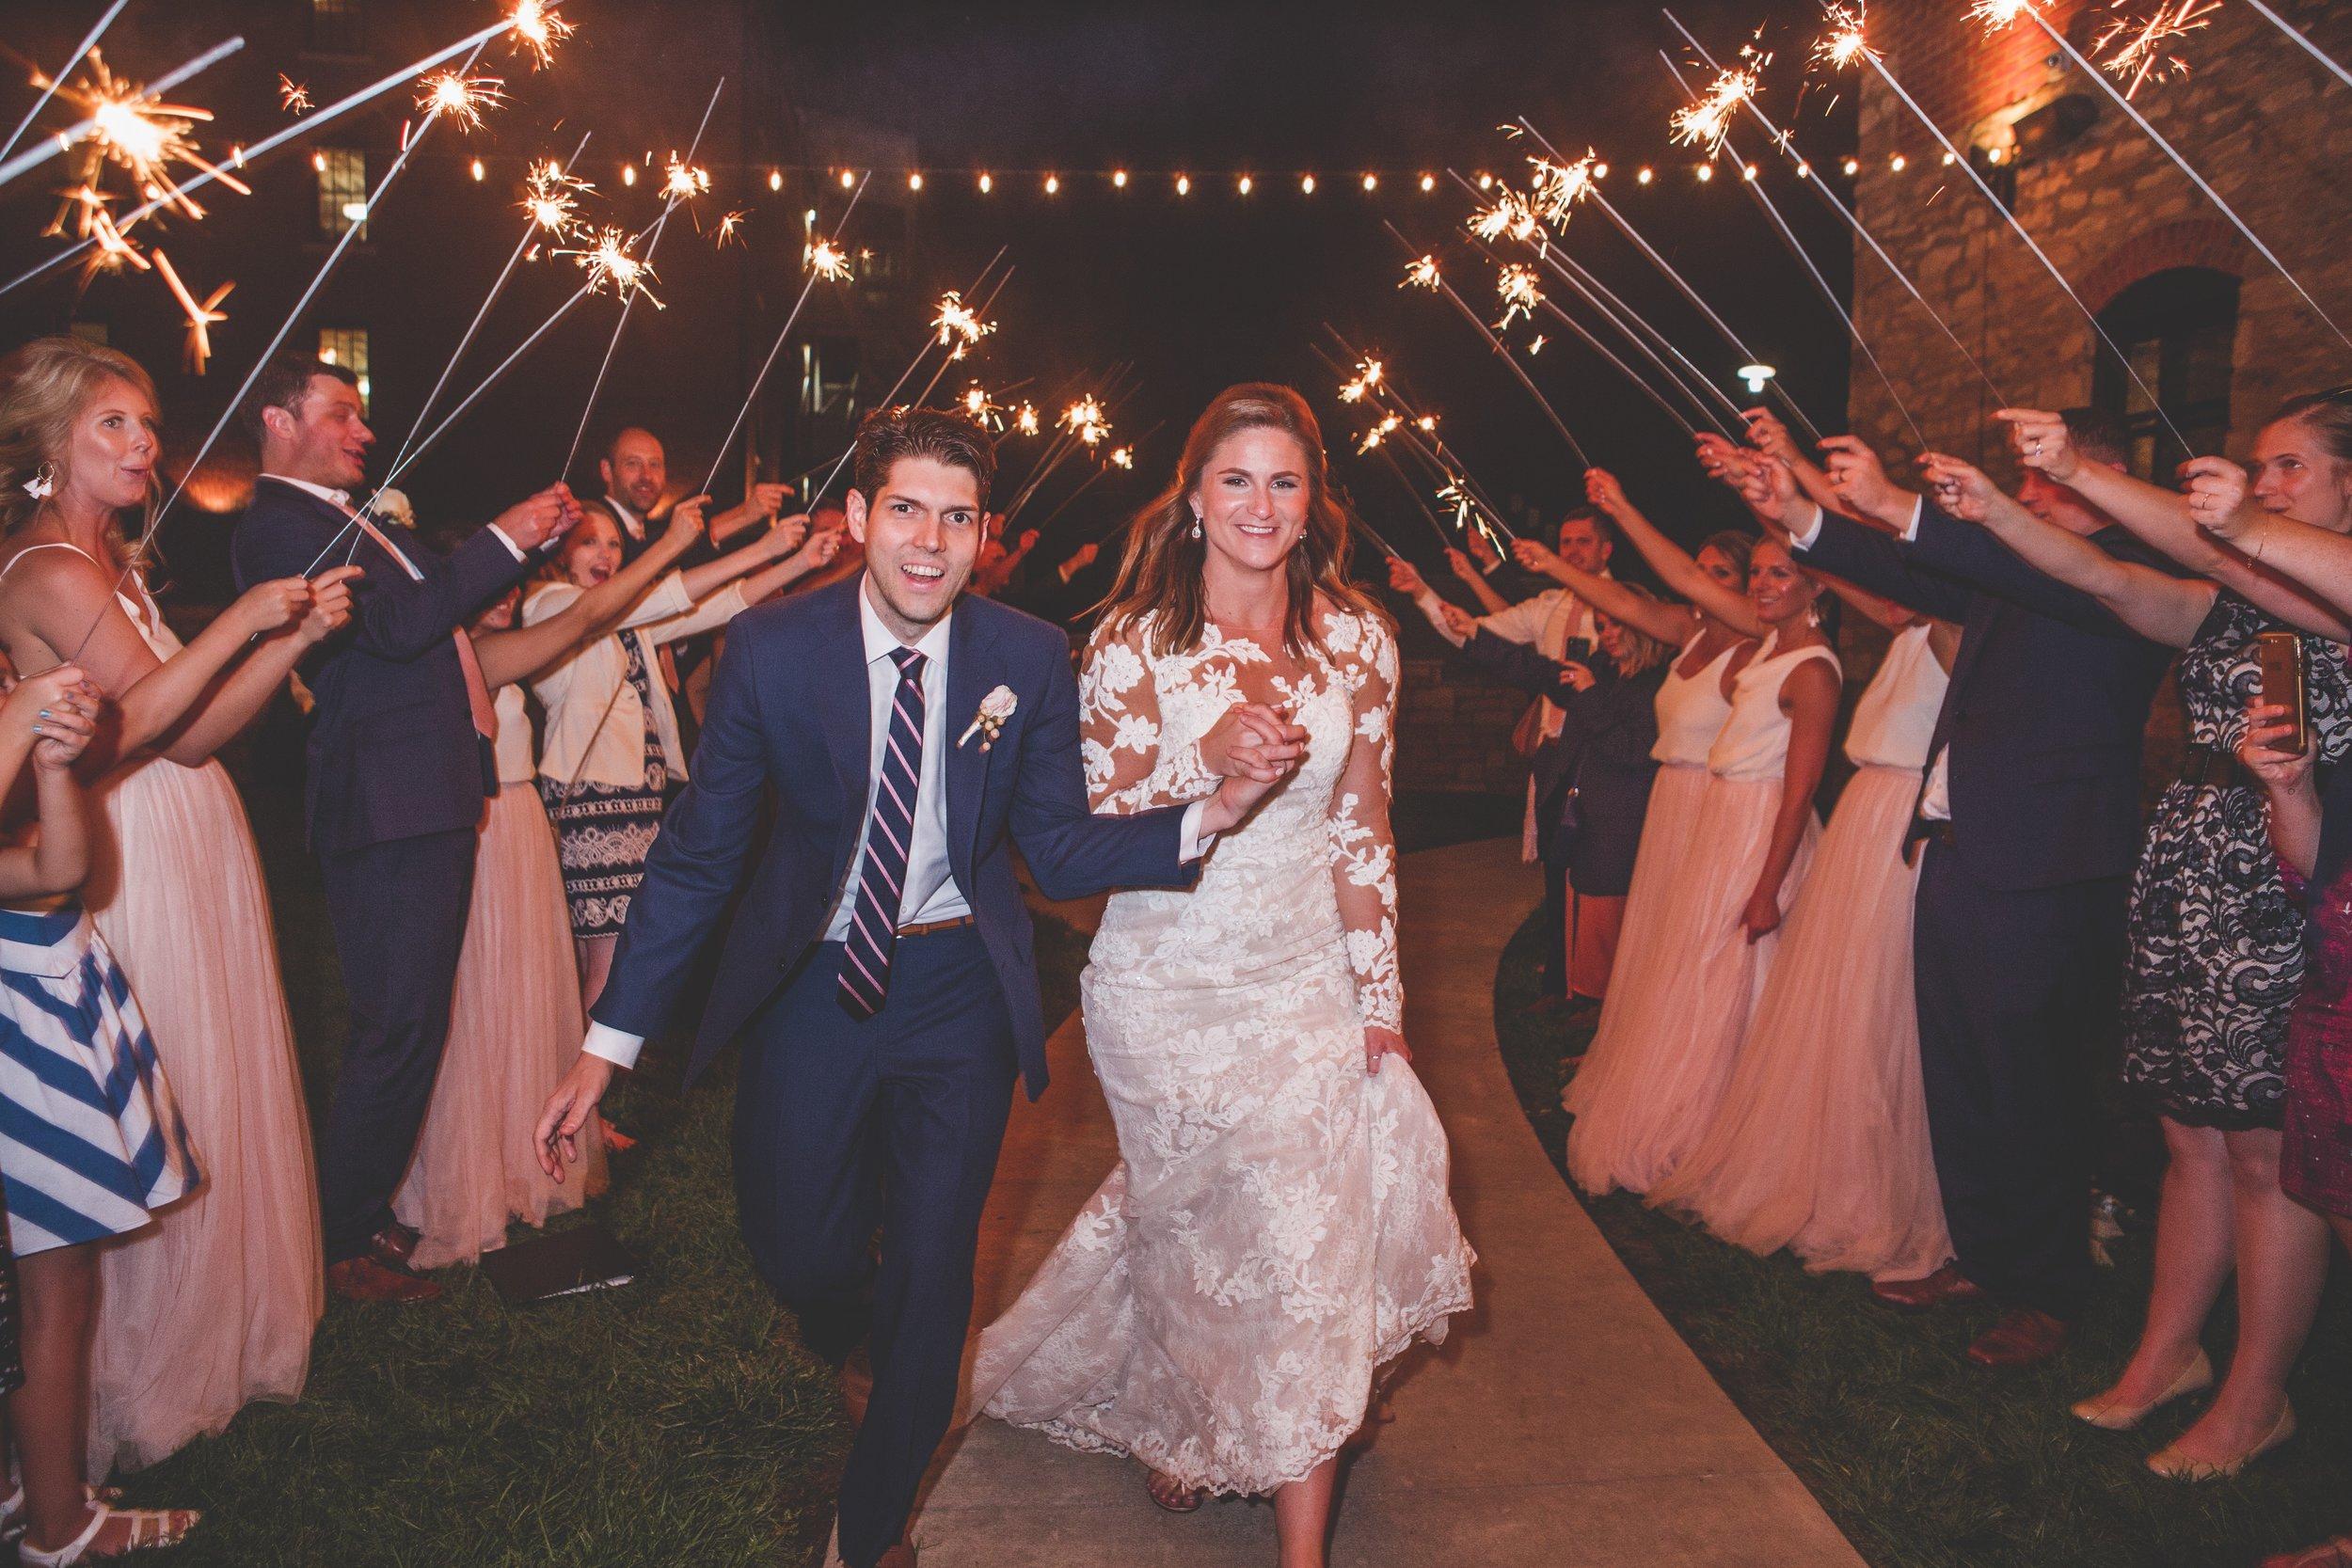 cider-gallery-lawrence-ks-wedding-photographer-jason-domingues-photography-lindsey-paul-0737.jpg